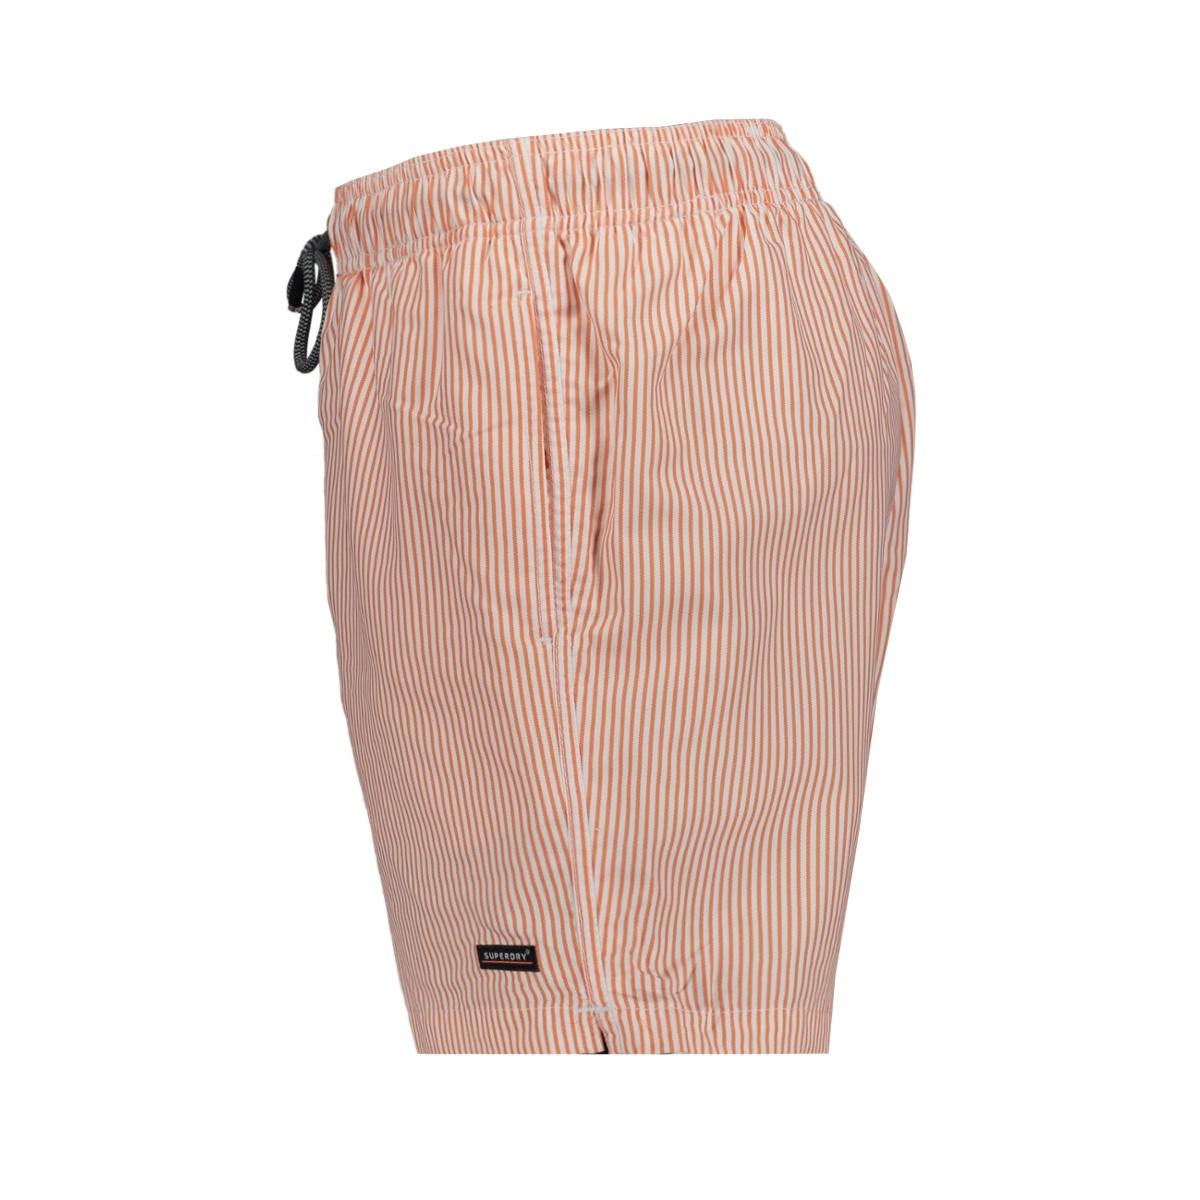 edit swim short m3010006a superdry korte broek orange sripe